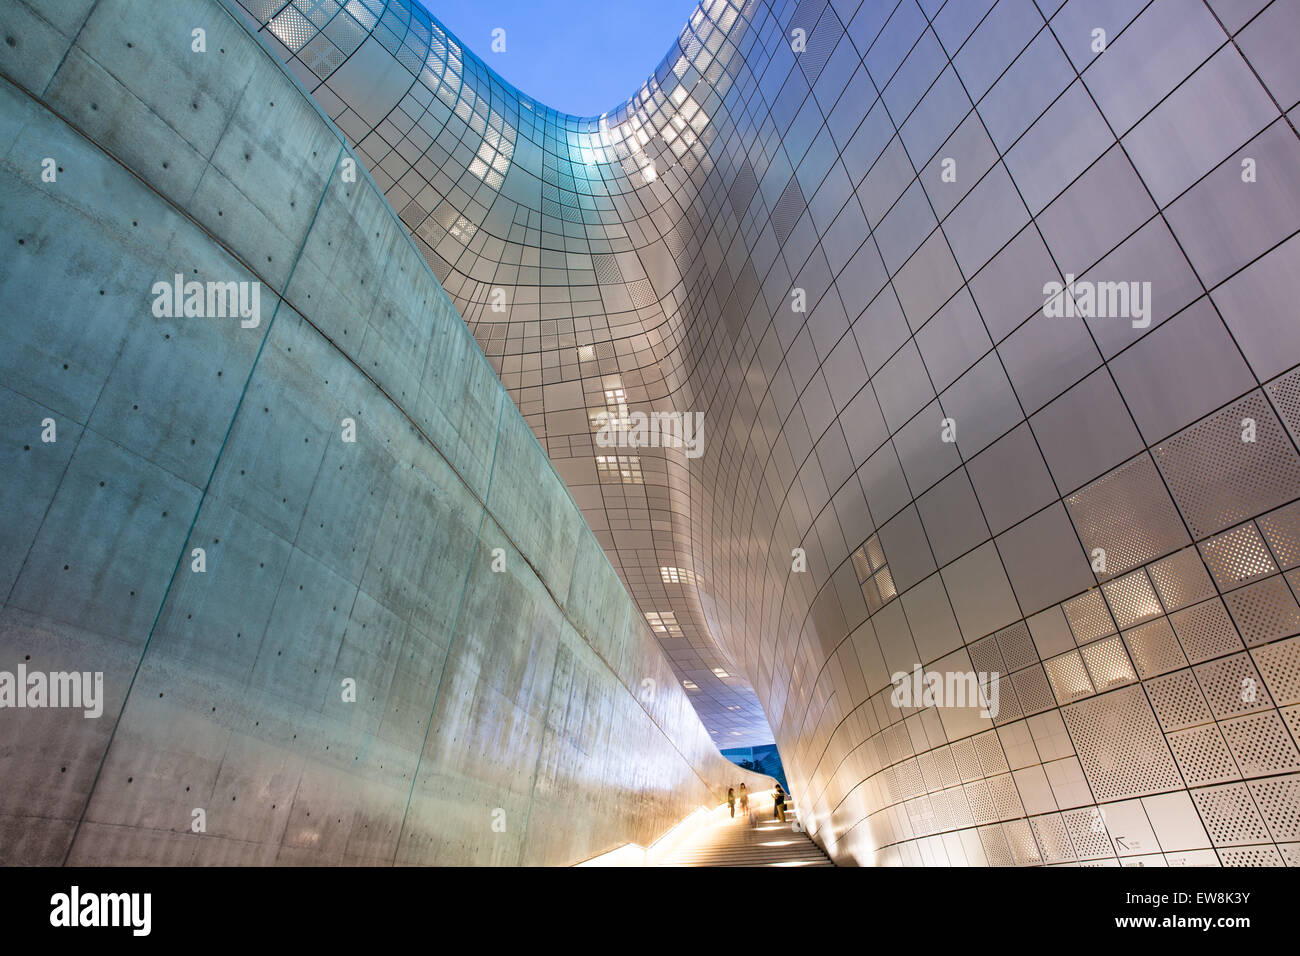 Seúl, República de Corea - 15 de agosto de 2014: Arquitectura moderna de Dongdaemun Plaza de noche, el Imagen De Stock